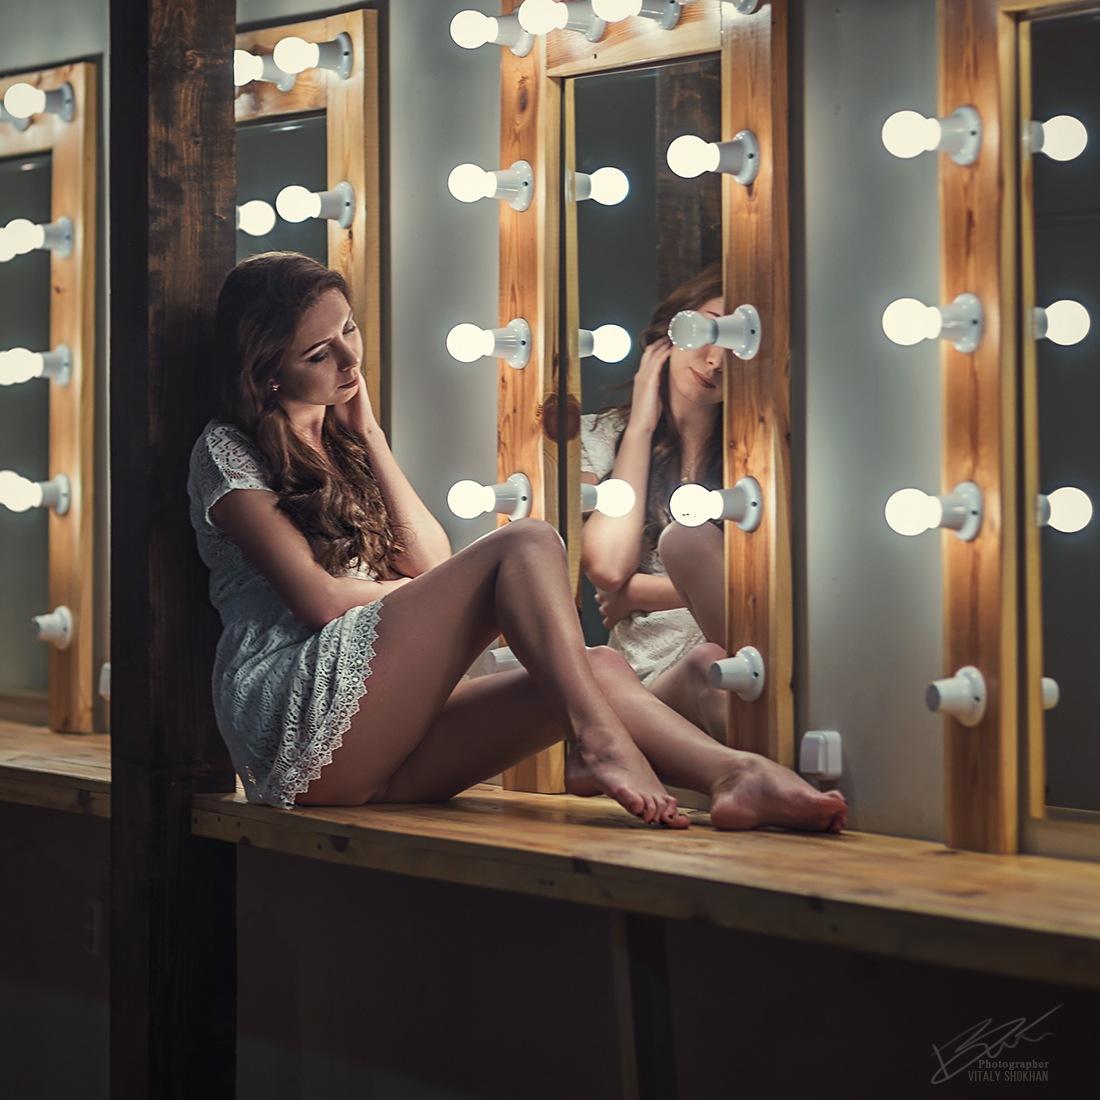 exquisite long bare feet by VitX.Minsk